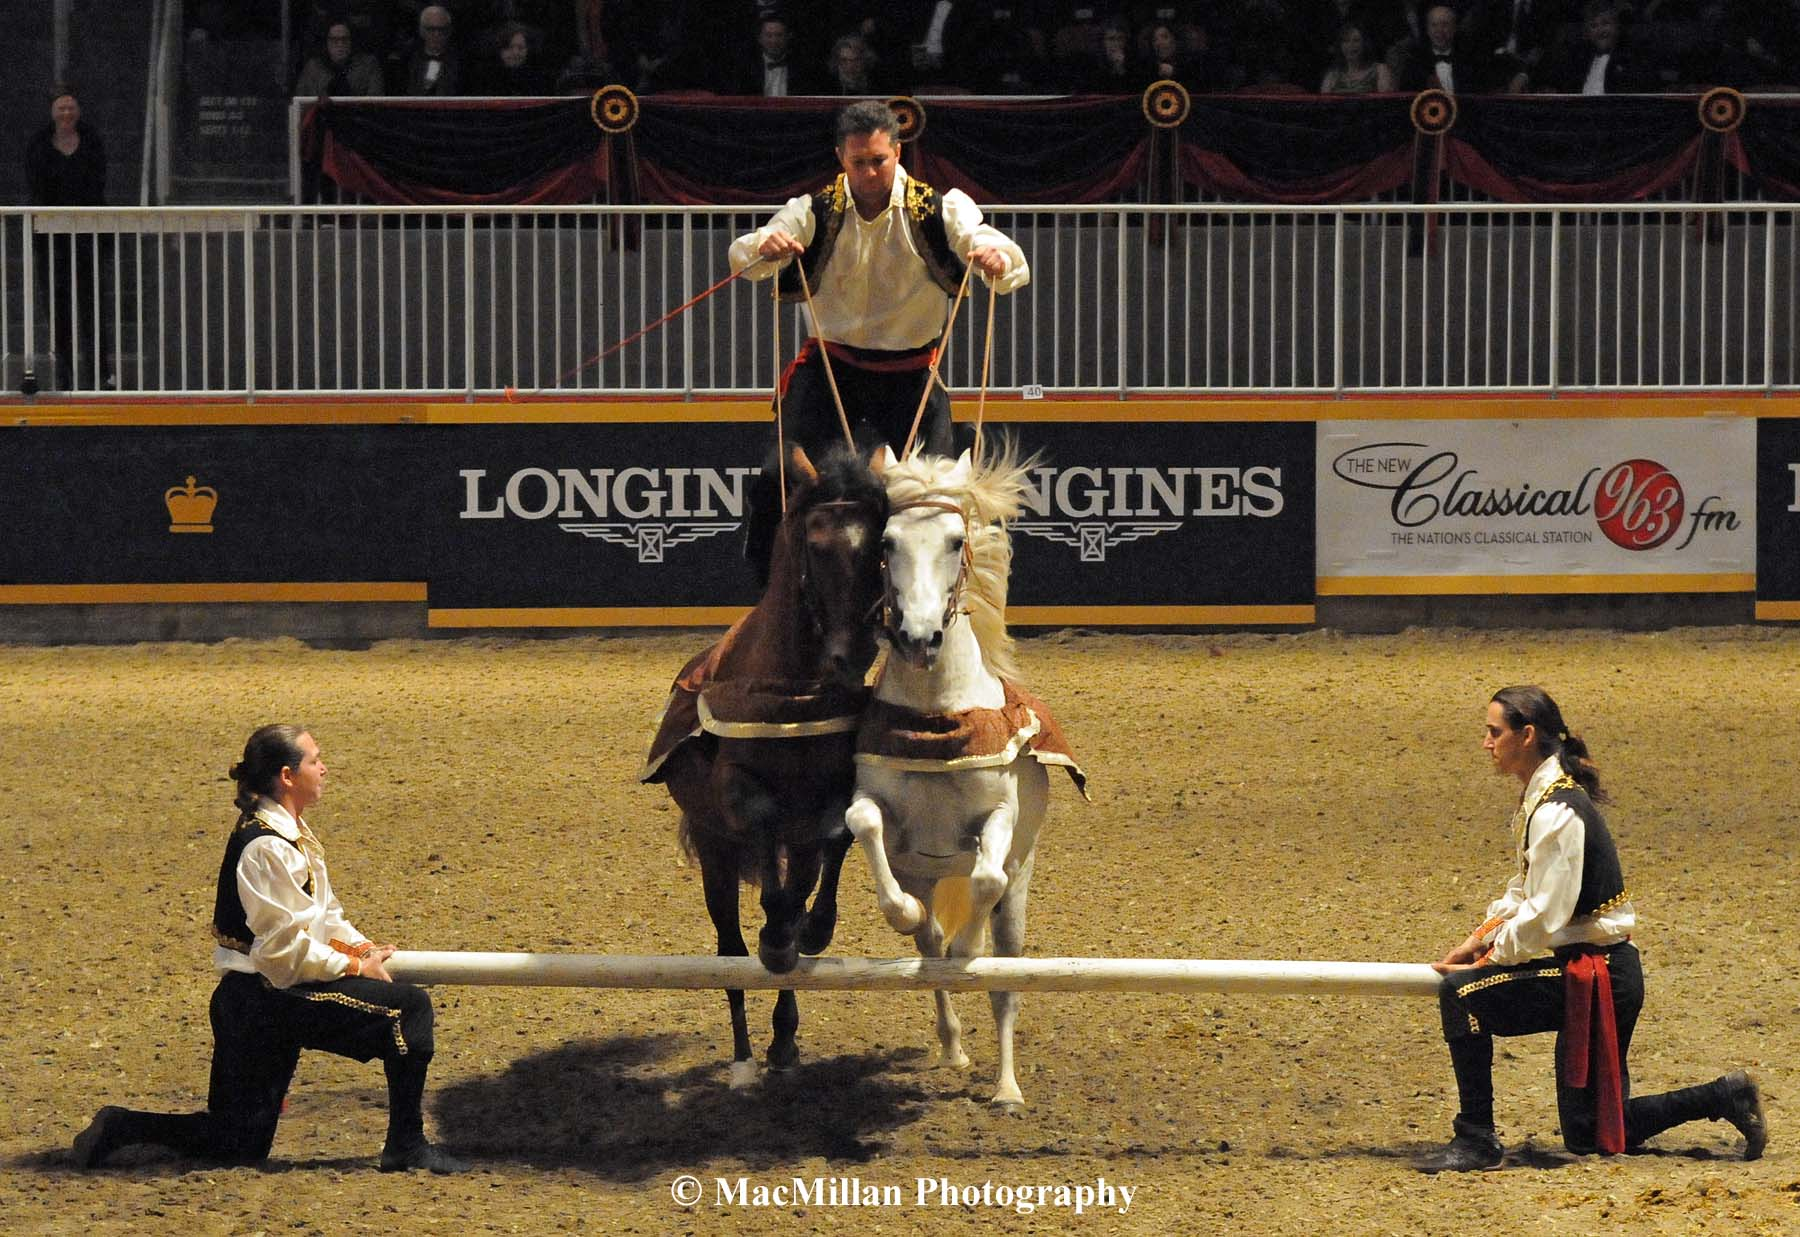 Photo 32 - The Cavallo troop member and his horses take a jump. Photo by Kim MacMillan/MacMillan Photography